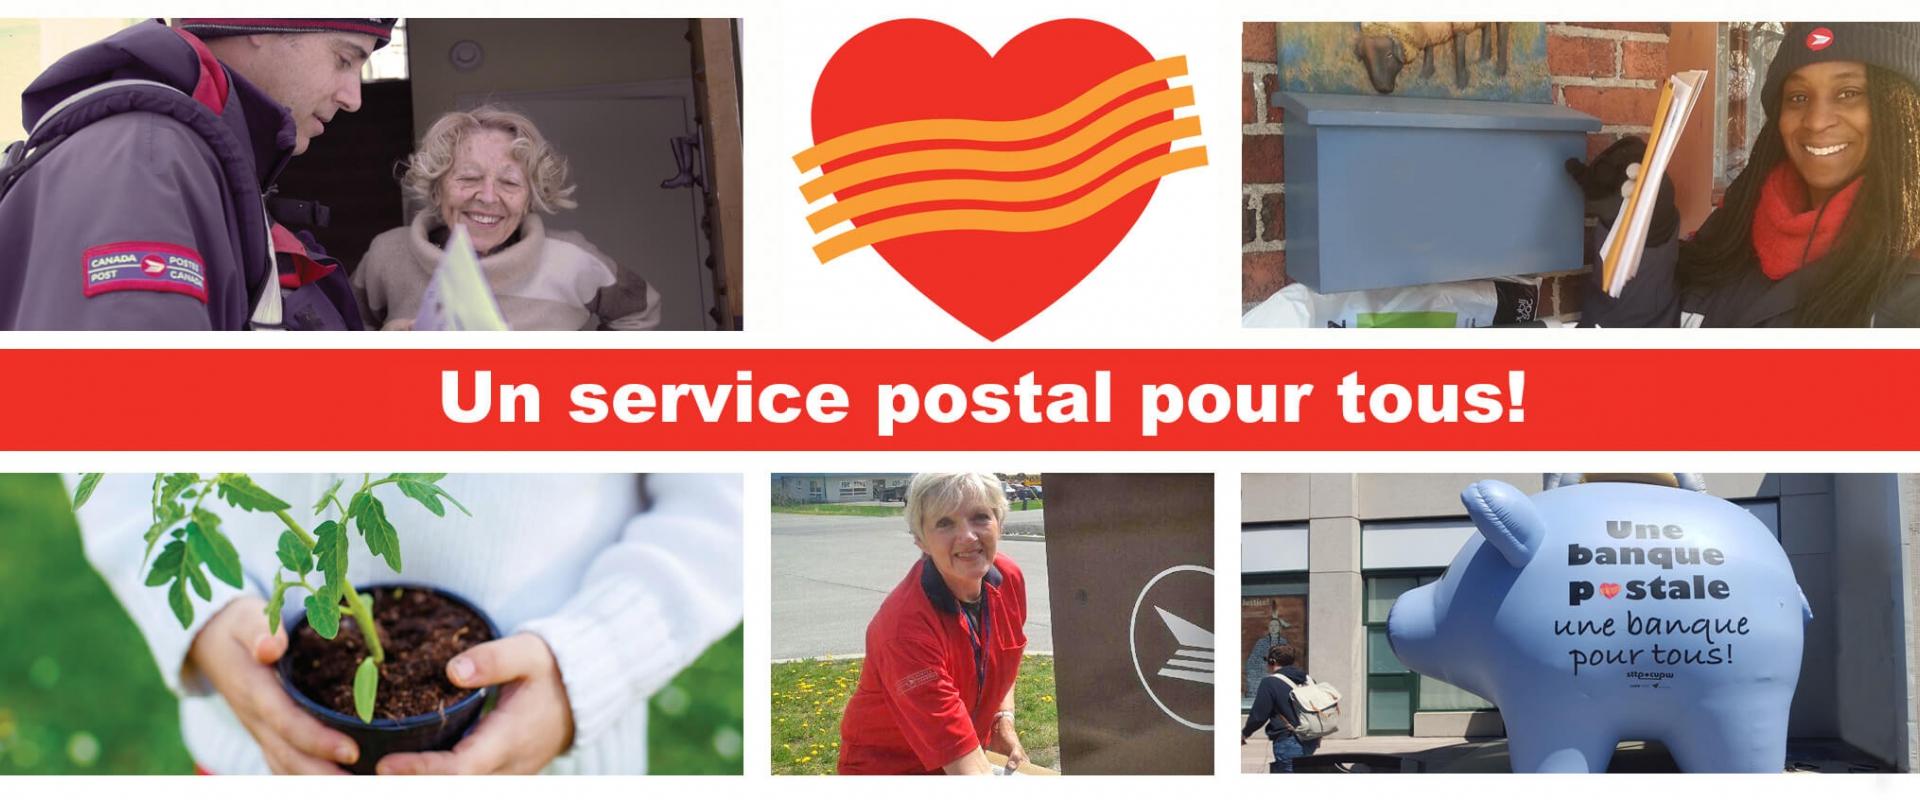 Un service postal pour tous! - Examen gouvernemental de Postes Canada